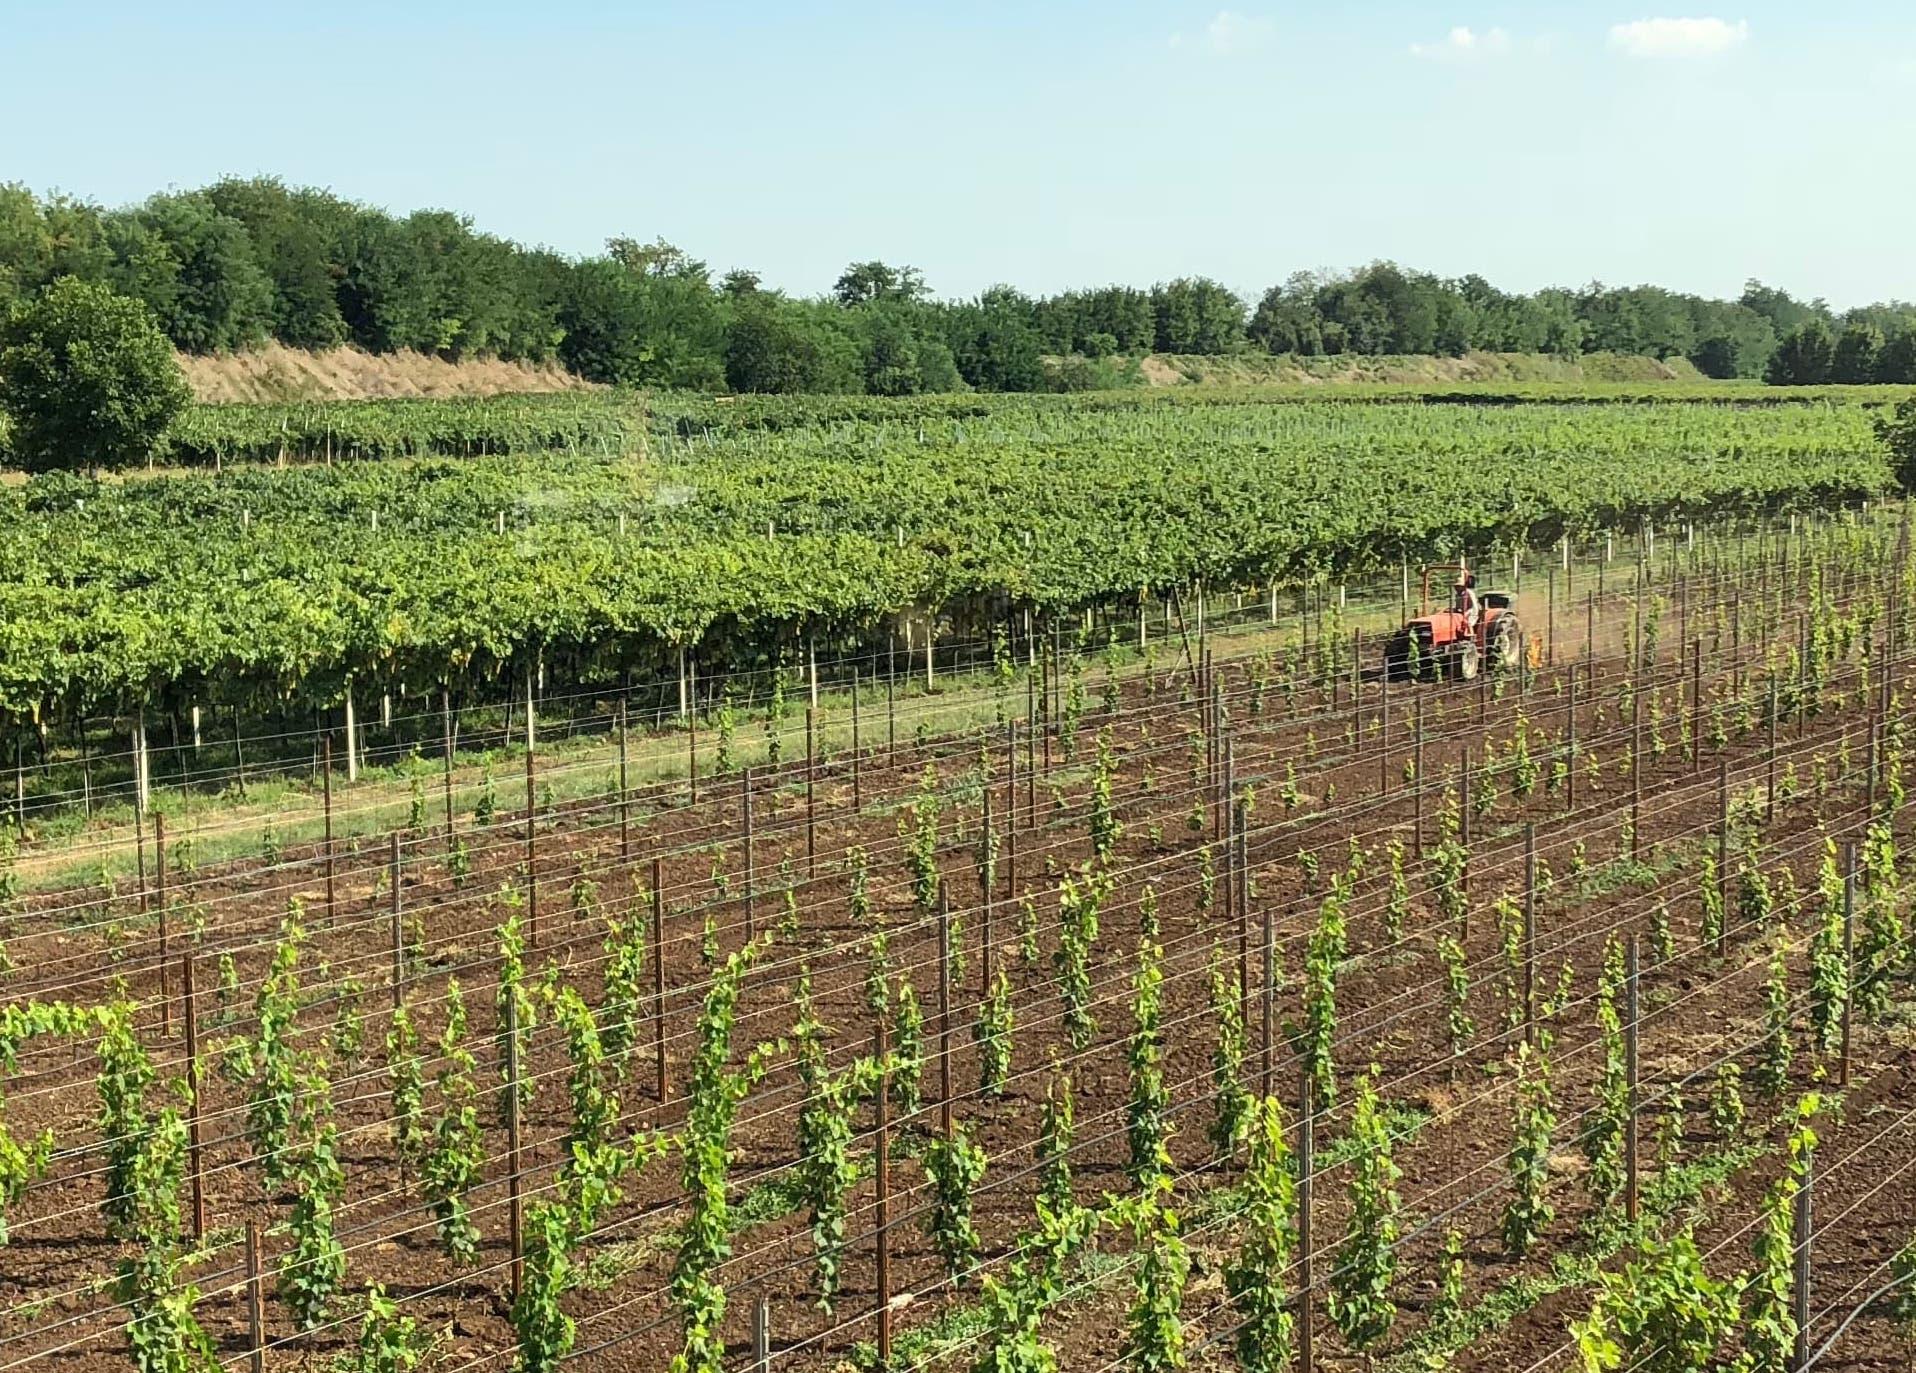 Gambellara Wine Festival at the Tenuta Grandi Winery